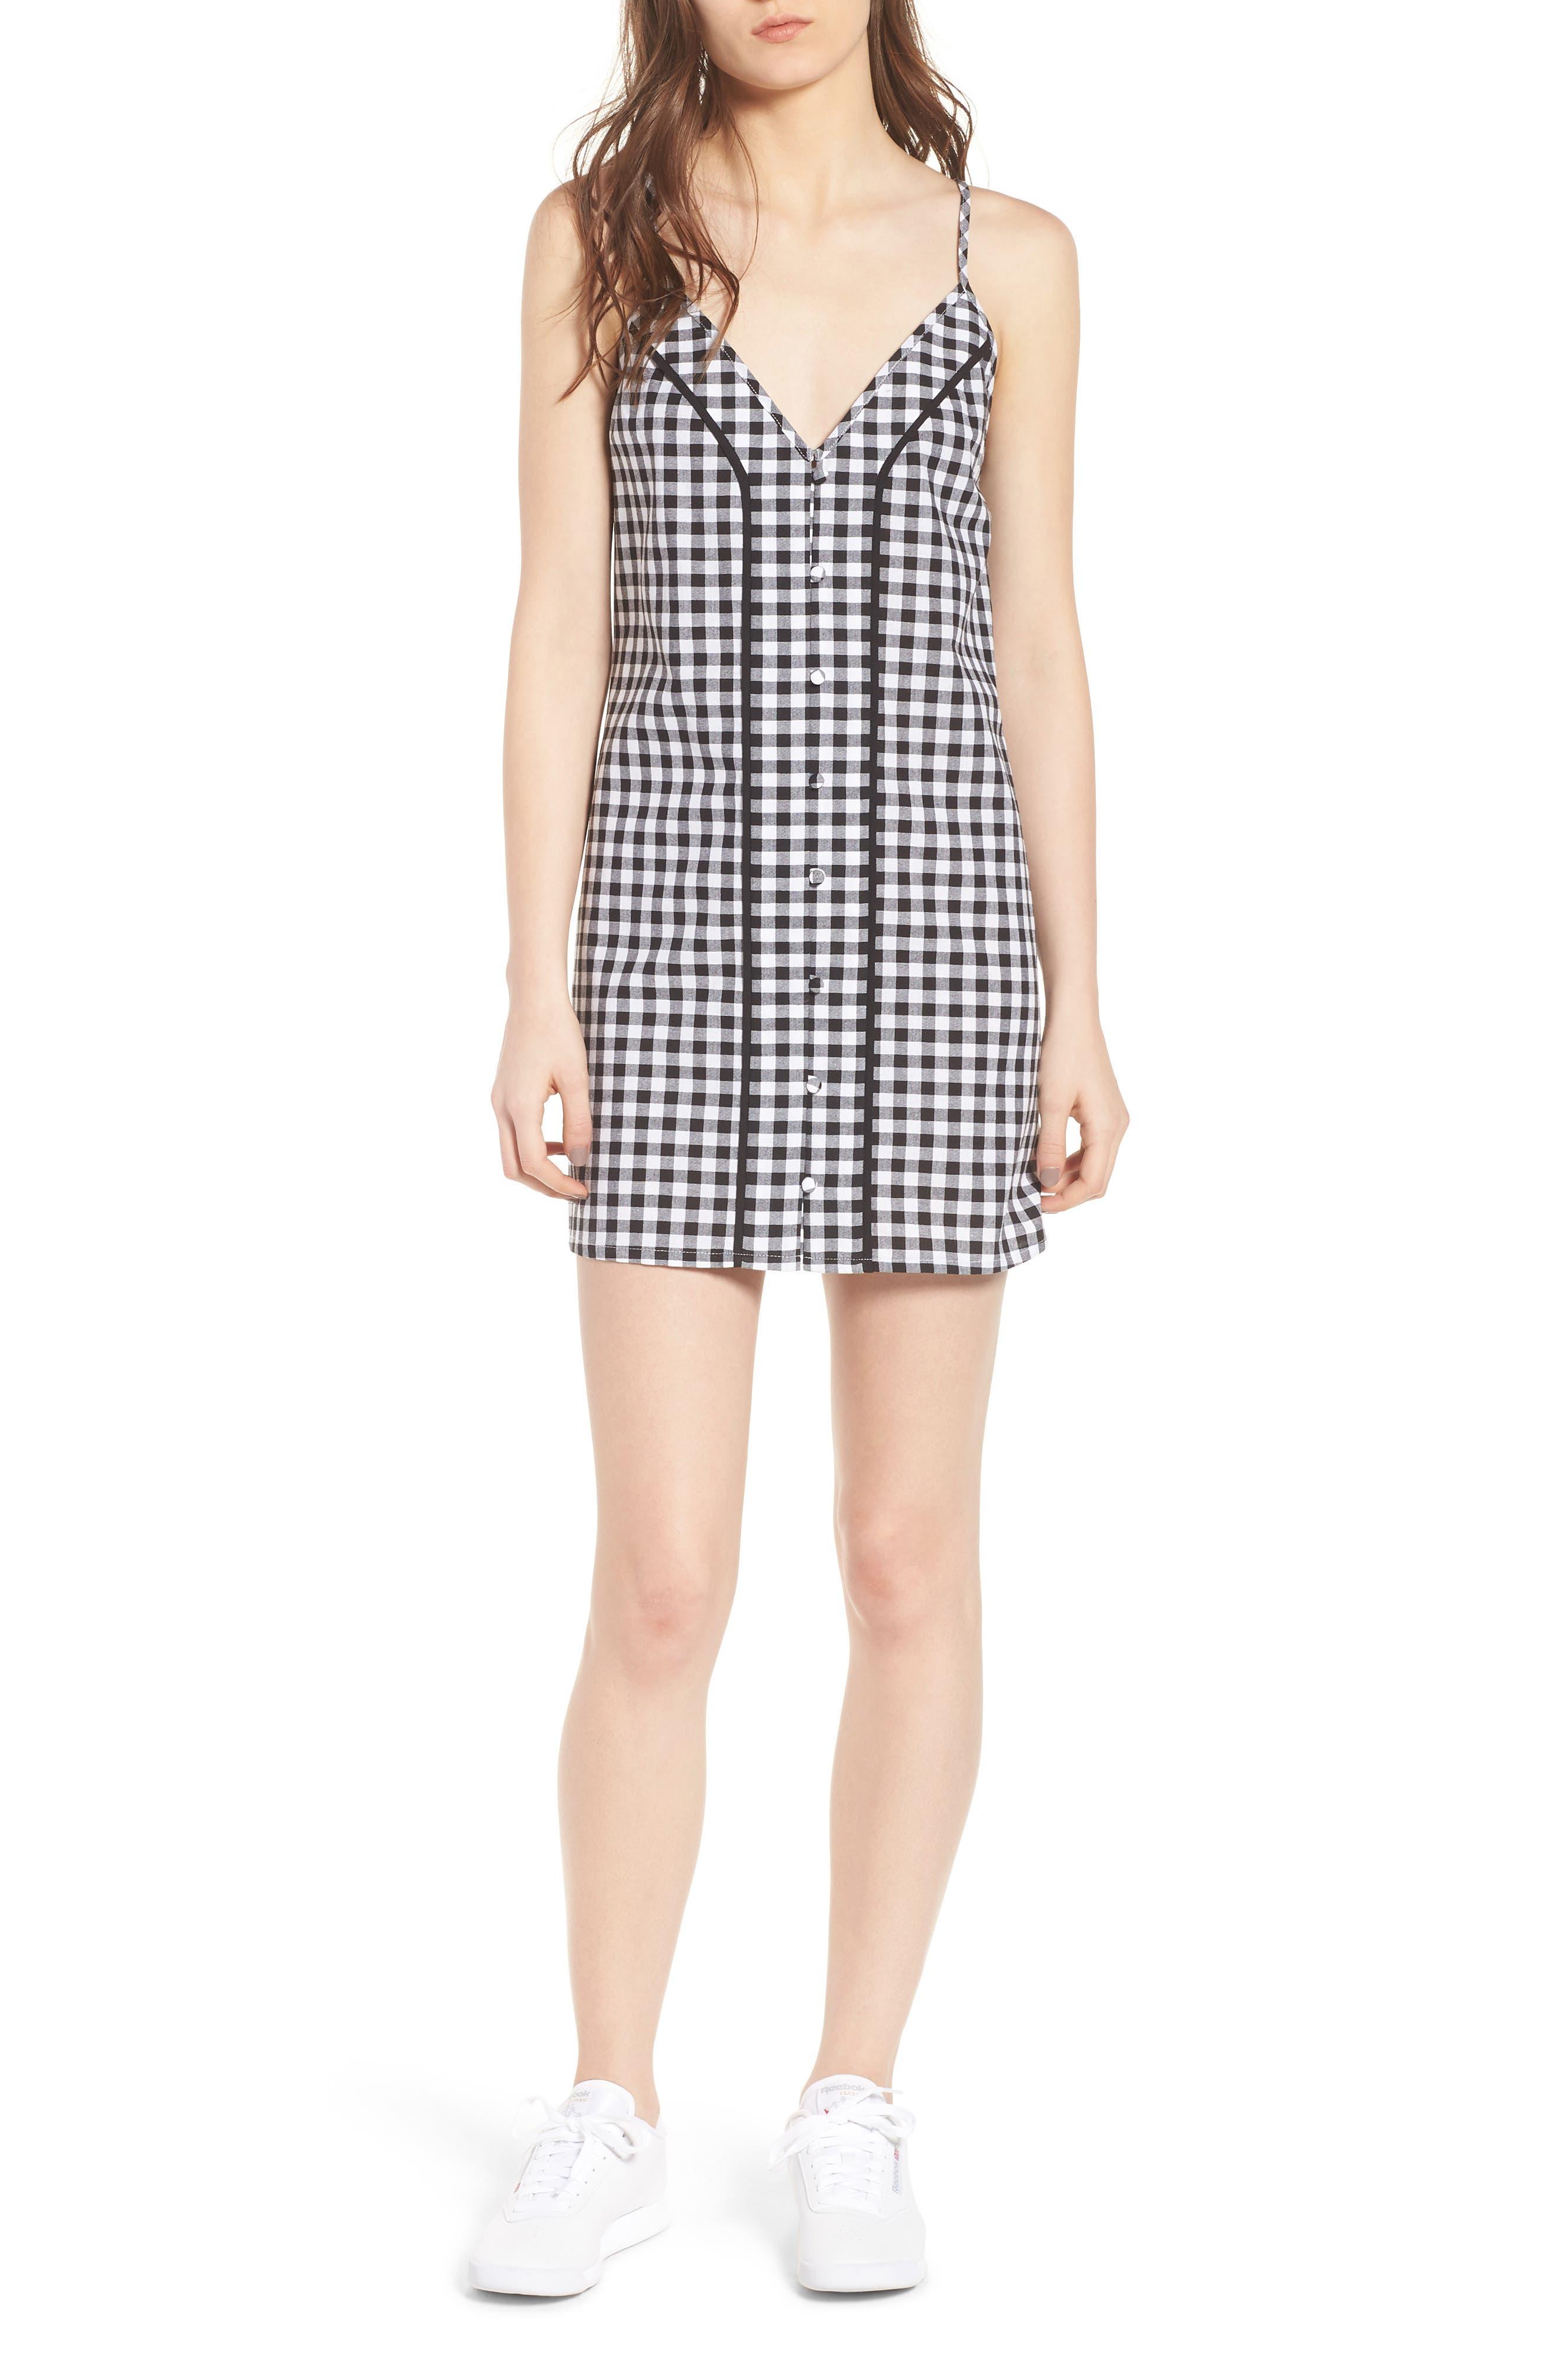 Idyllic Gingham Dress,                         Main,                         color, Black W White